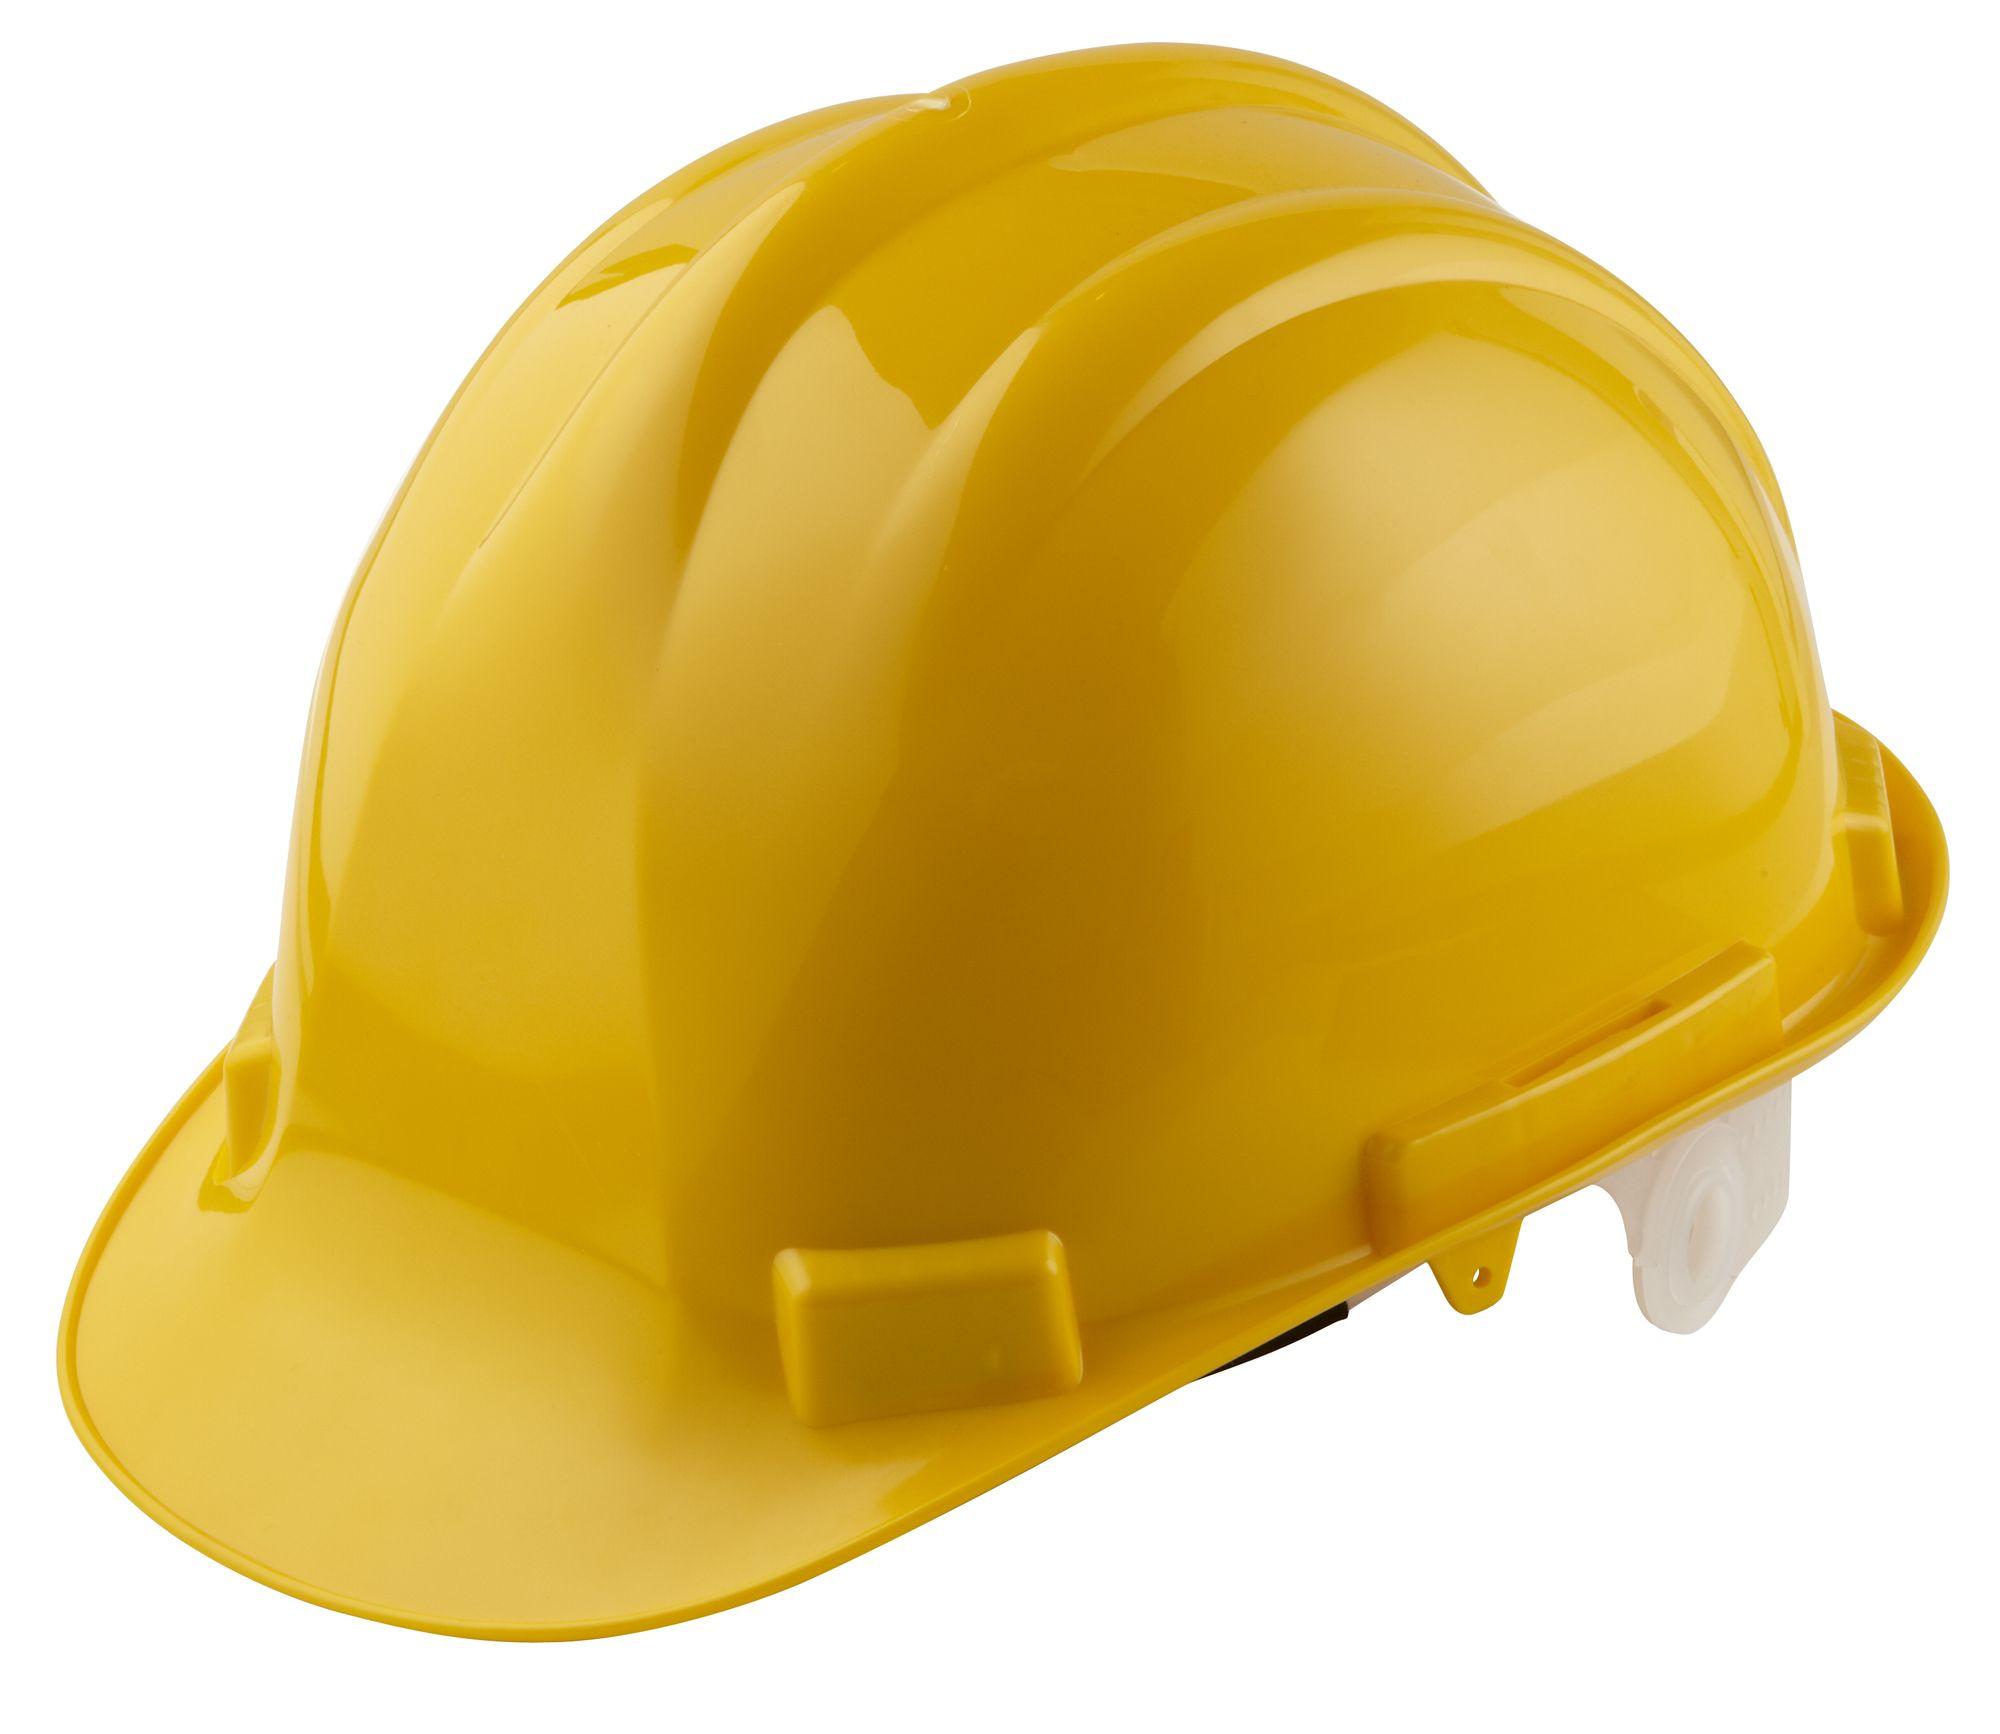 B Amp Q Safety Helmet Departments Diy At B Amp Q